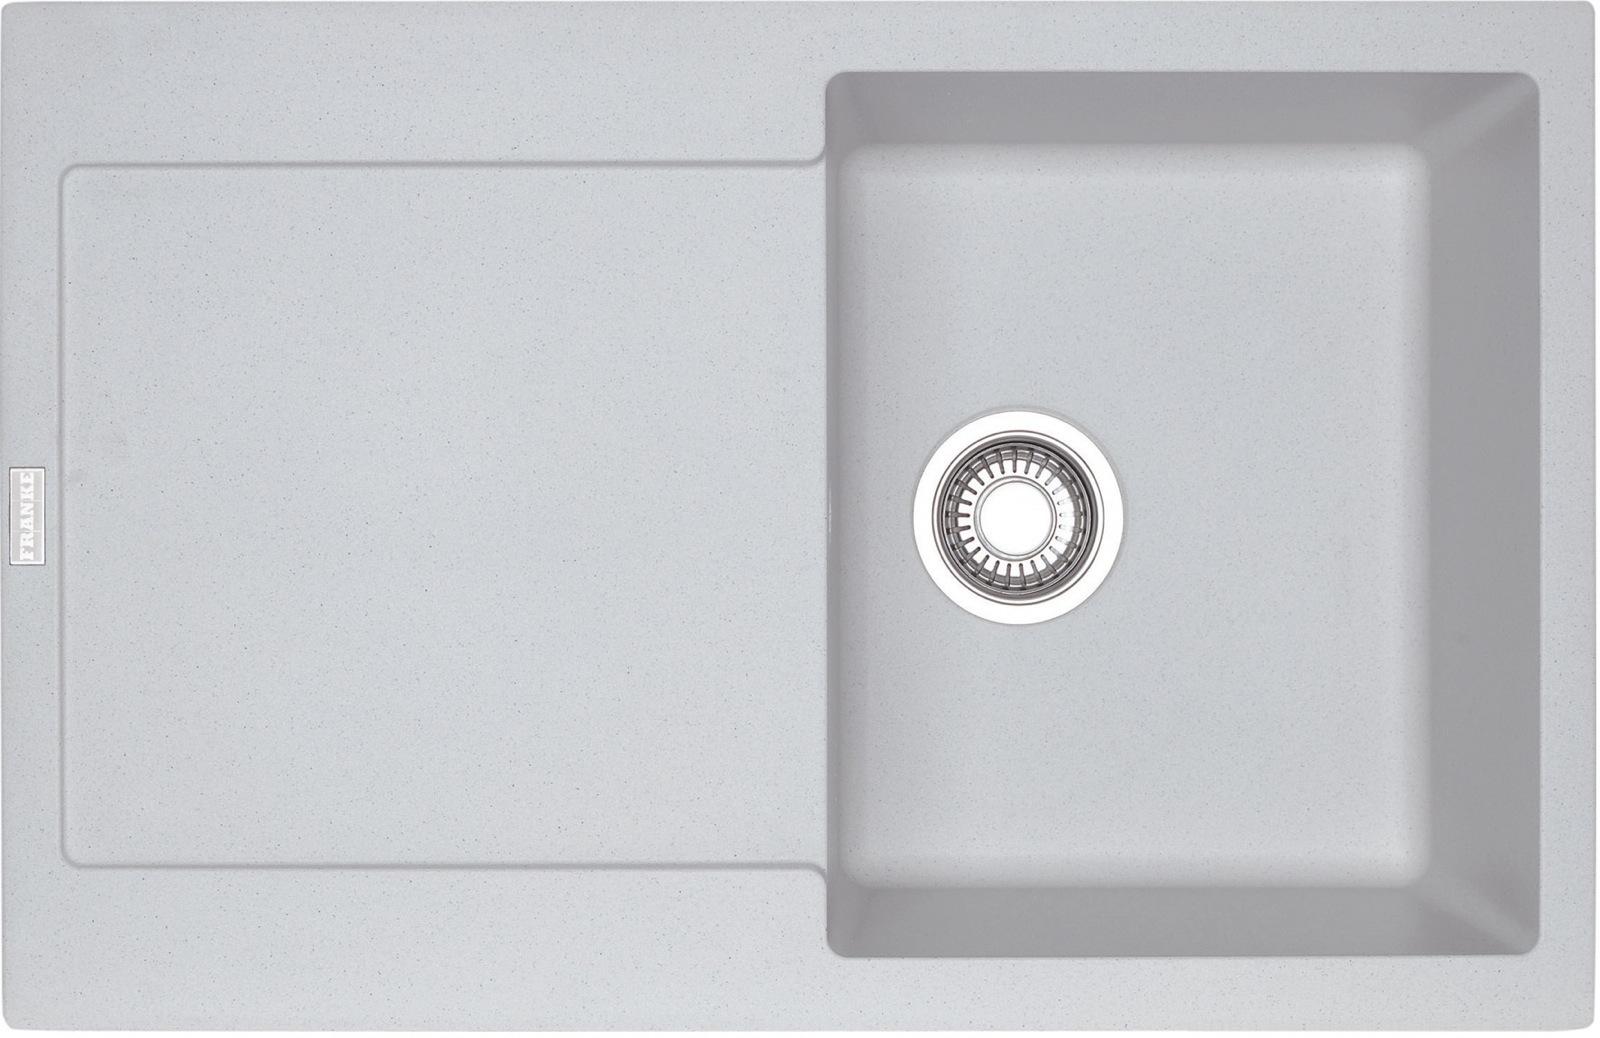 Chiuveta bucatarie fragranite Franke Maris MRG 611 reversibila 780x500mm tehnologie Sanitized Bianco imagine